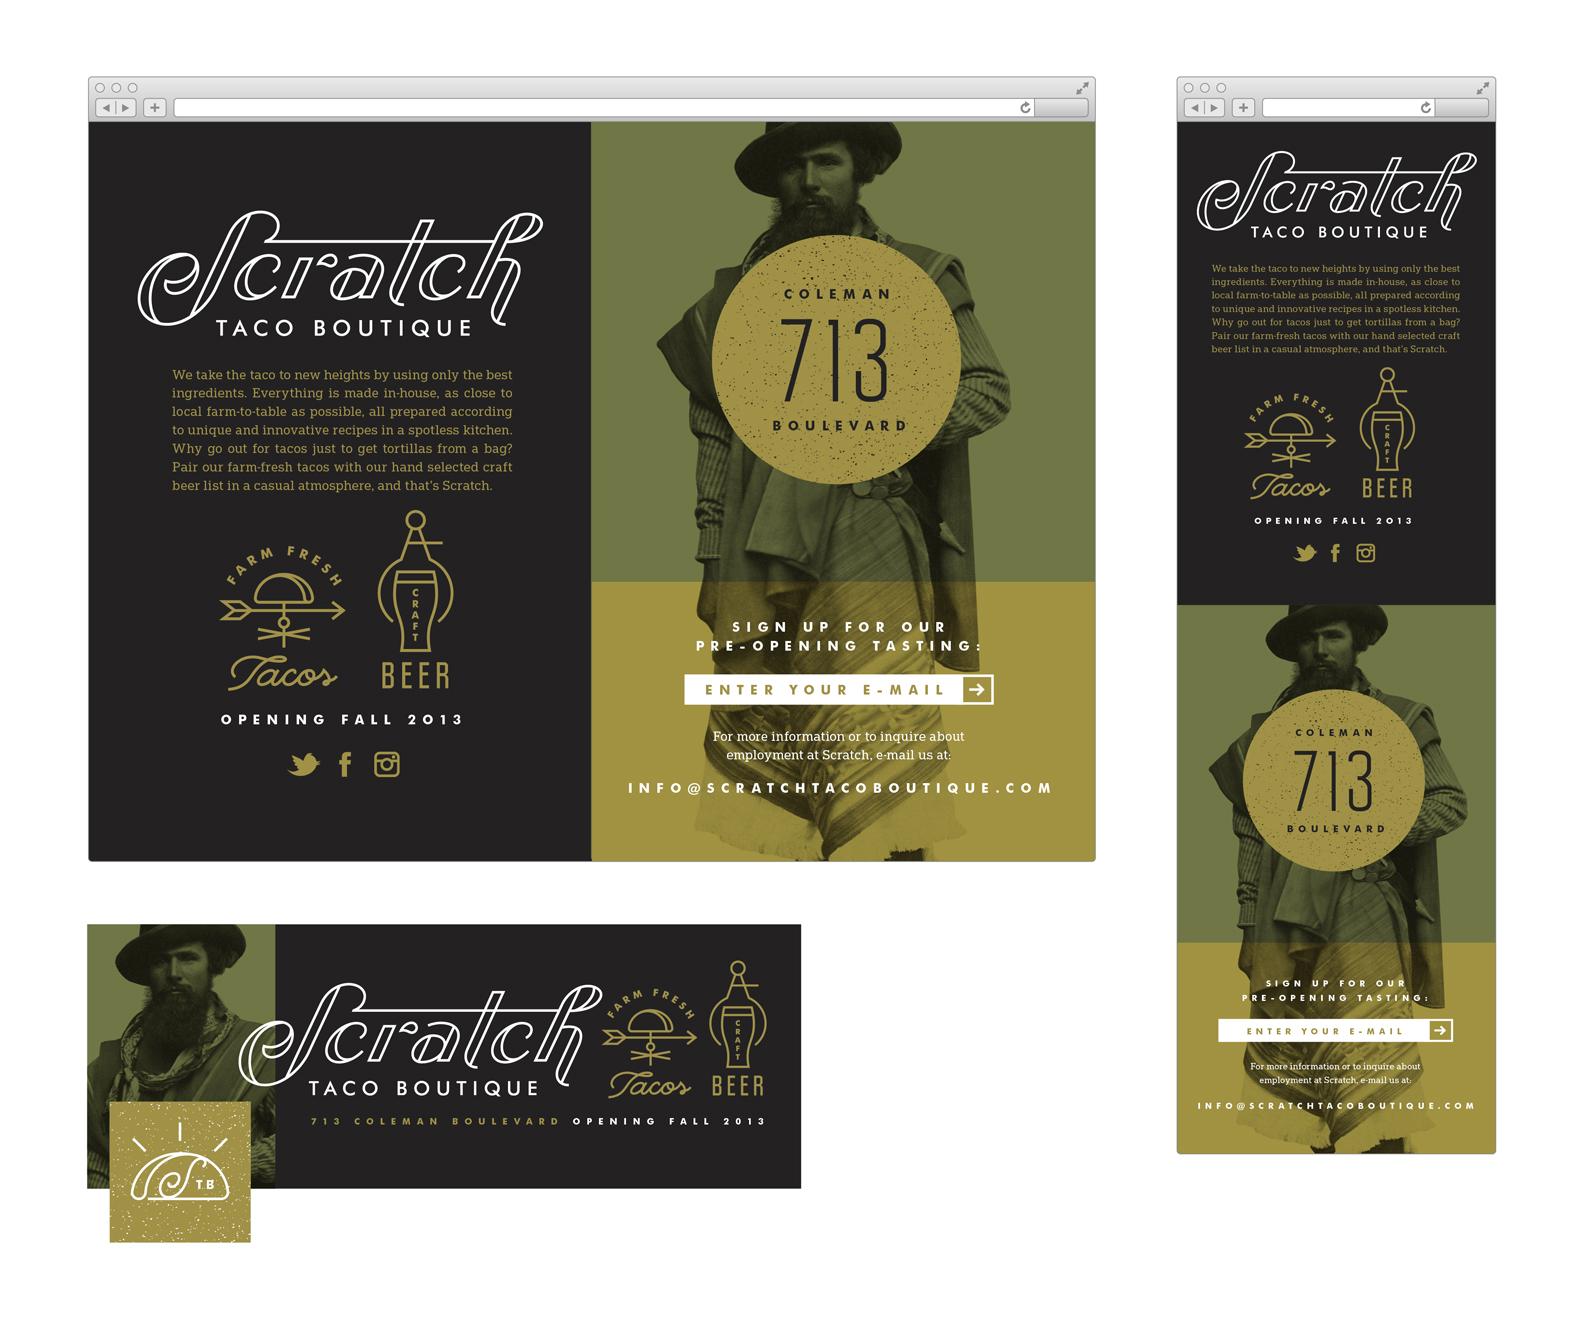 SCRATCH_TACO_BOUTIQUE_WEB.jpg by J Fletcher Design